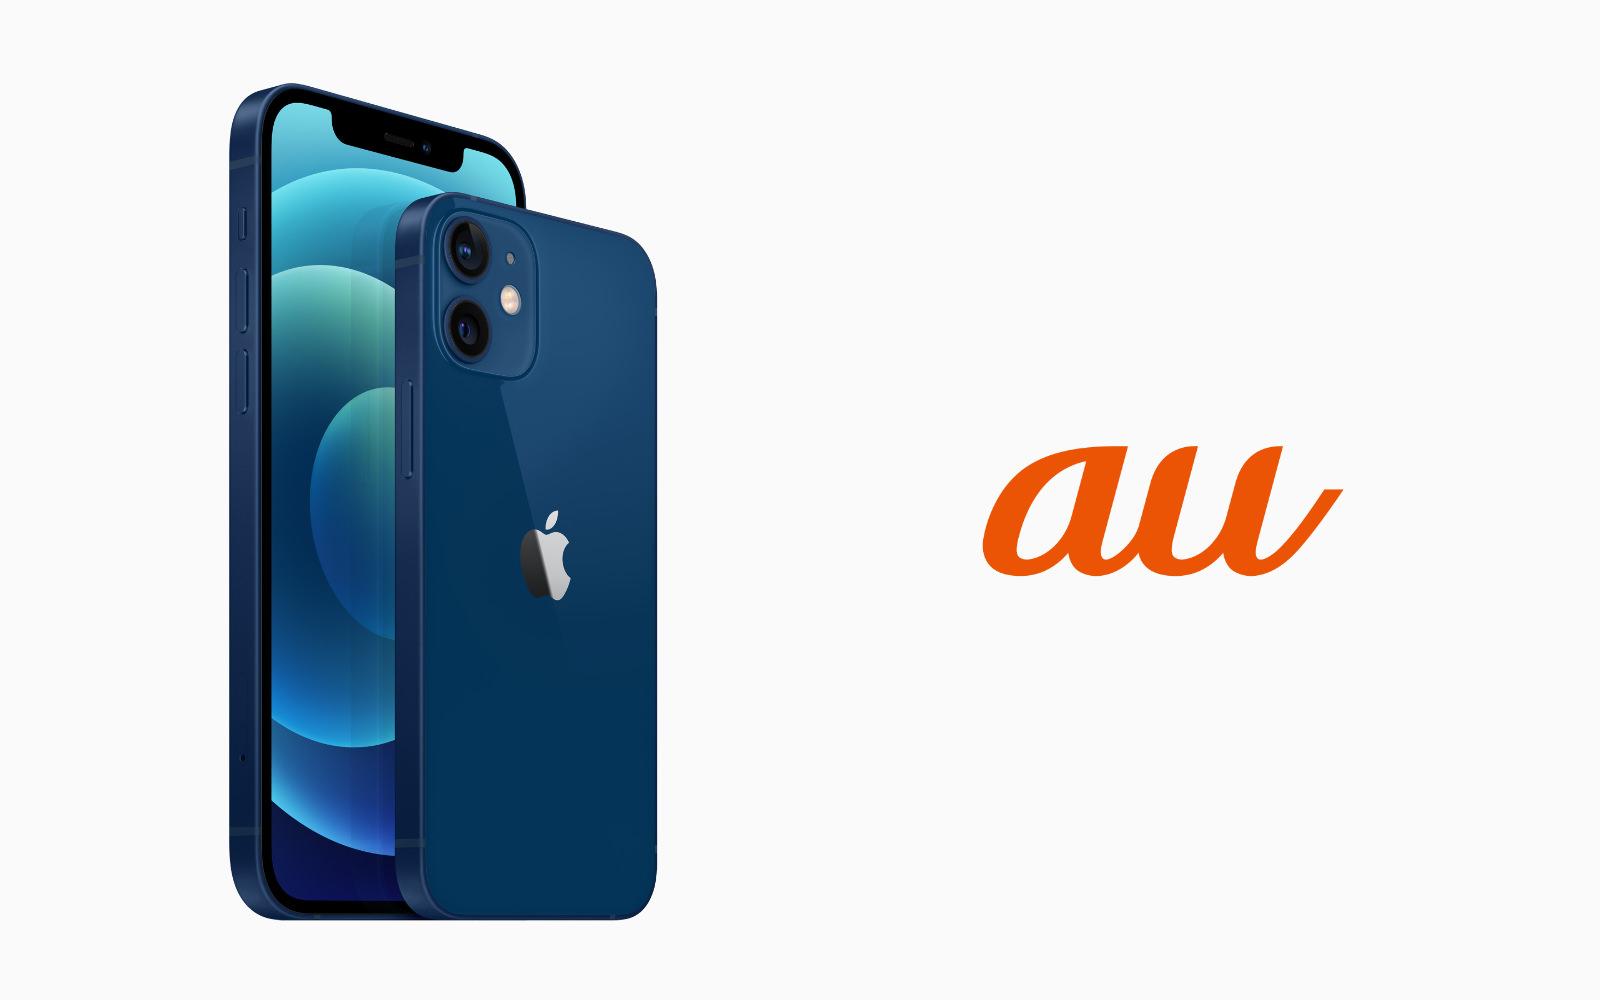 Au iphone 12 series